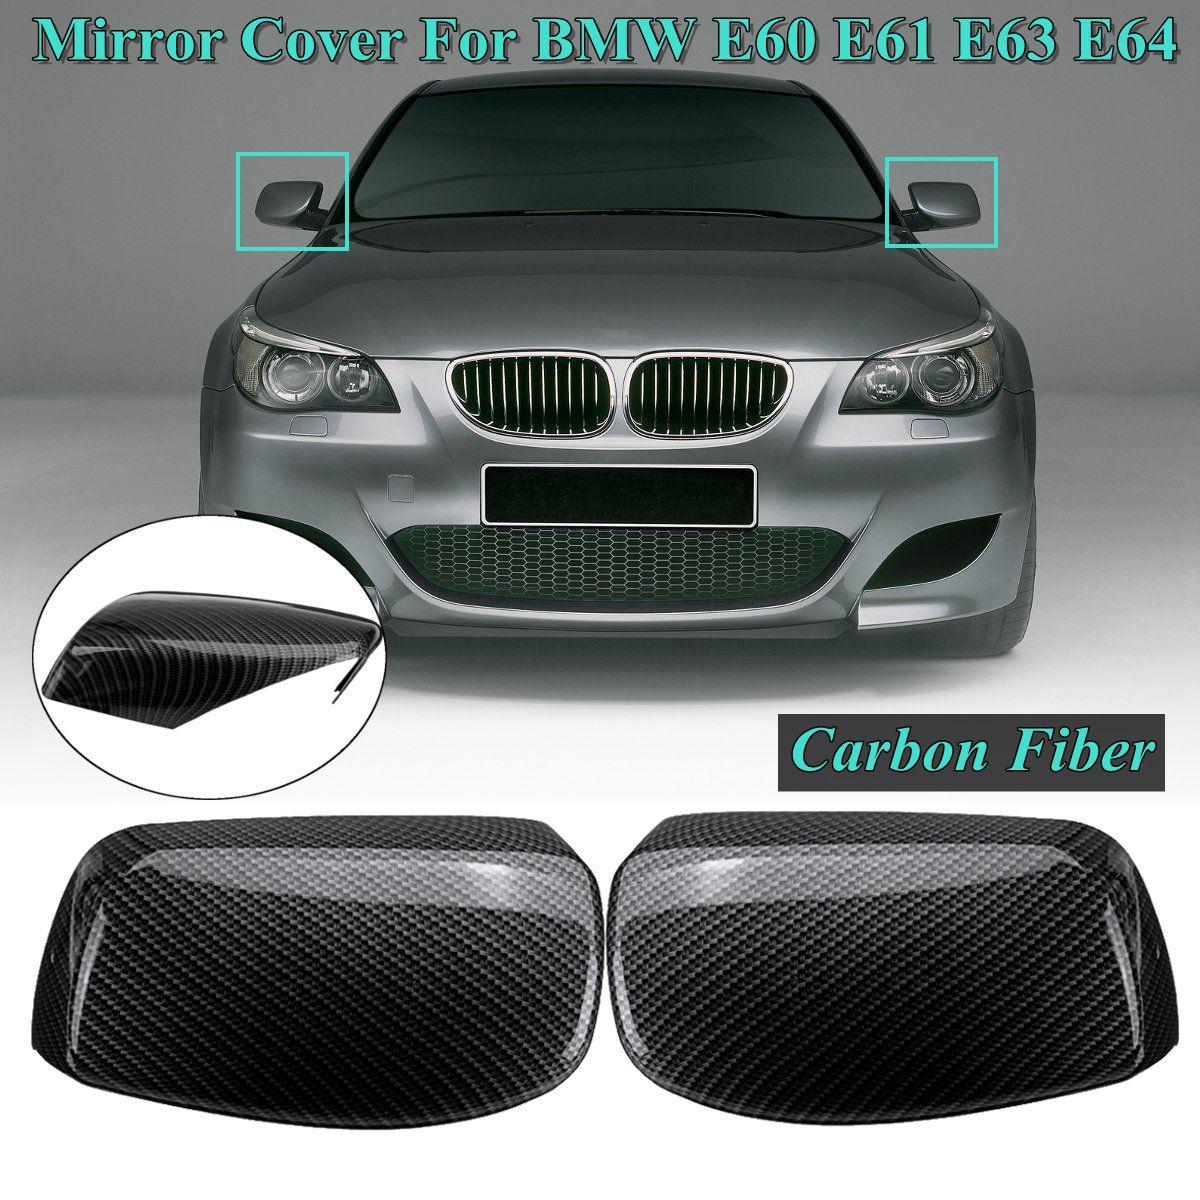 1 Pair ABS Carbon Fiber Look Side Rearview Wing Mirror Cover Caps for BMW E60 E61 E63 E64 2003 2004 2005 2006 2007 20081 Pair ABS Carbon Fiber Look Side Rearview Wing Mirror Cover Caps for BMW E60 E61 E63 E64 2003 2004 2005 2006 2007 2008